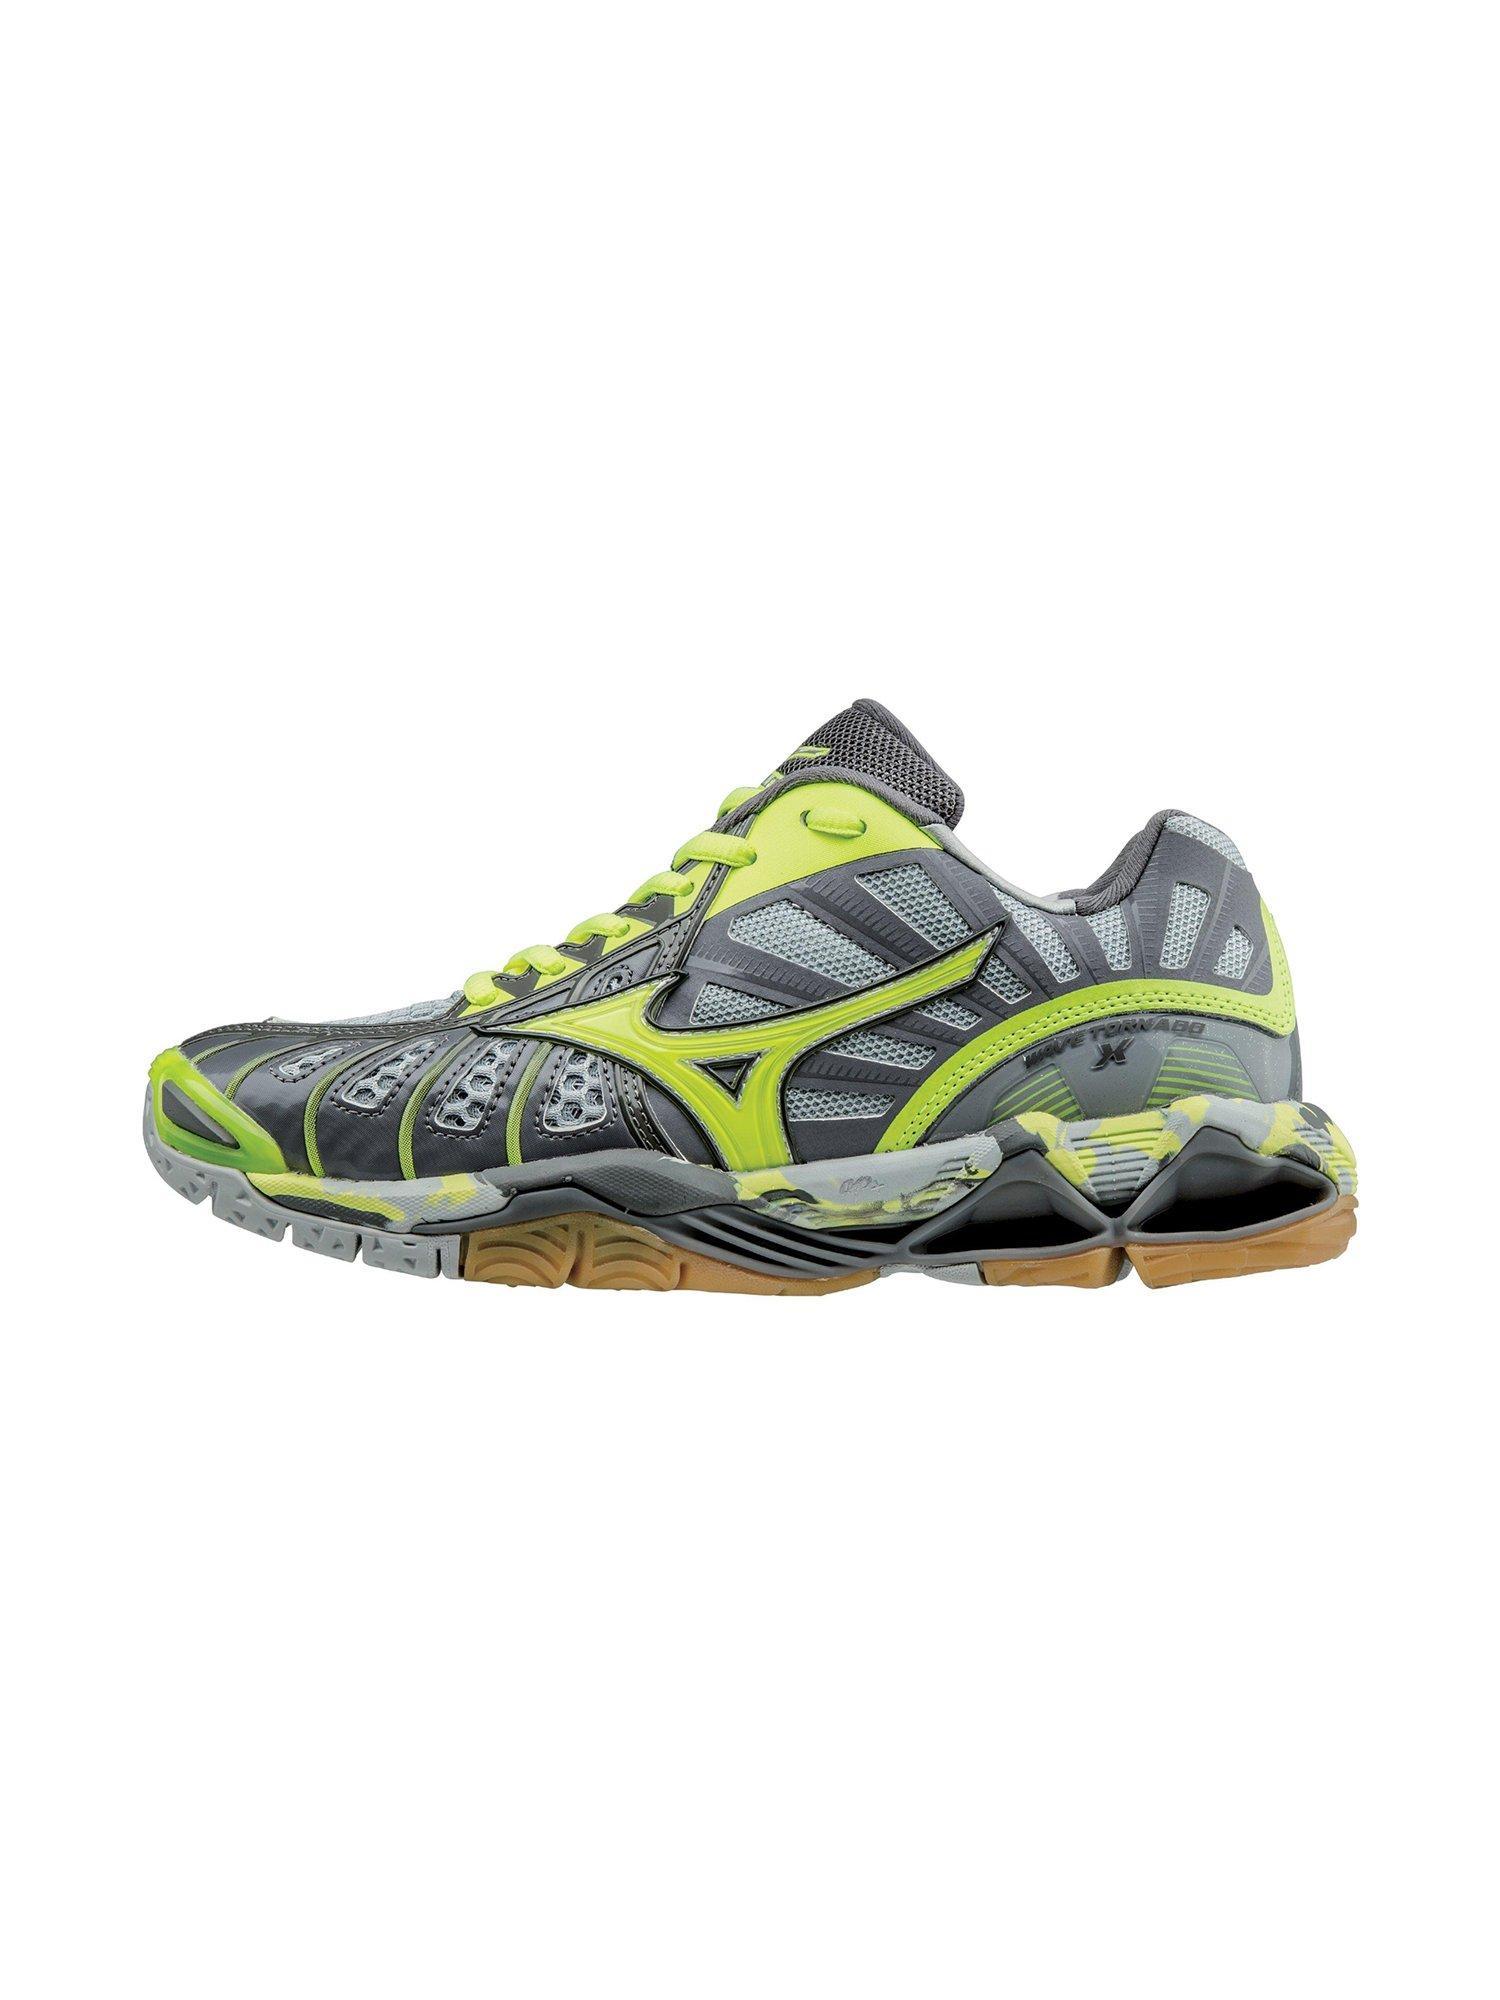 Mizuno Womens Volleyball Shoes - Women's Wave Tornado X - 430200